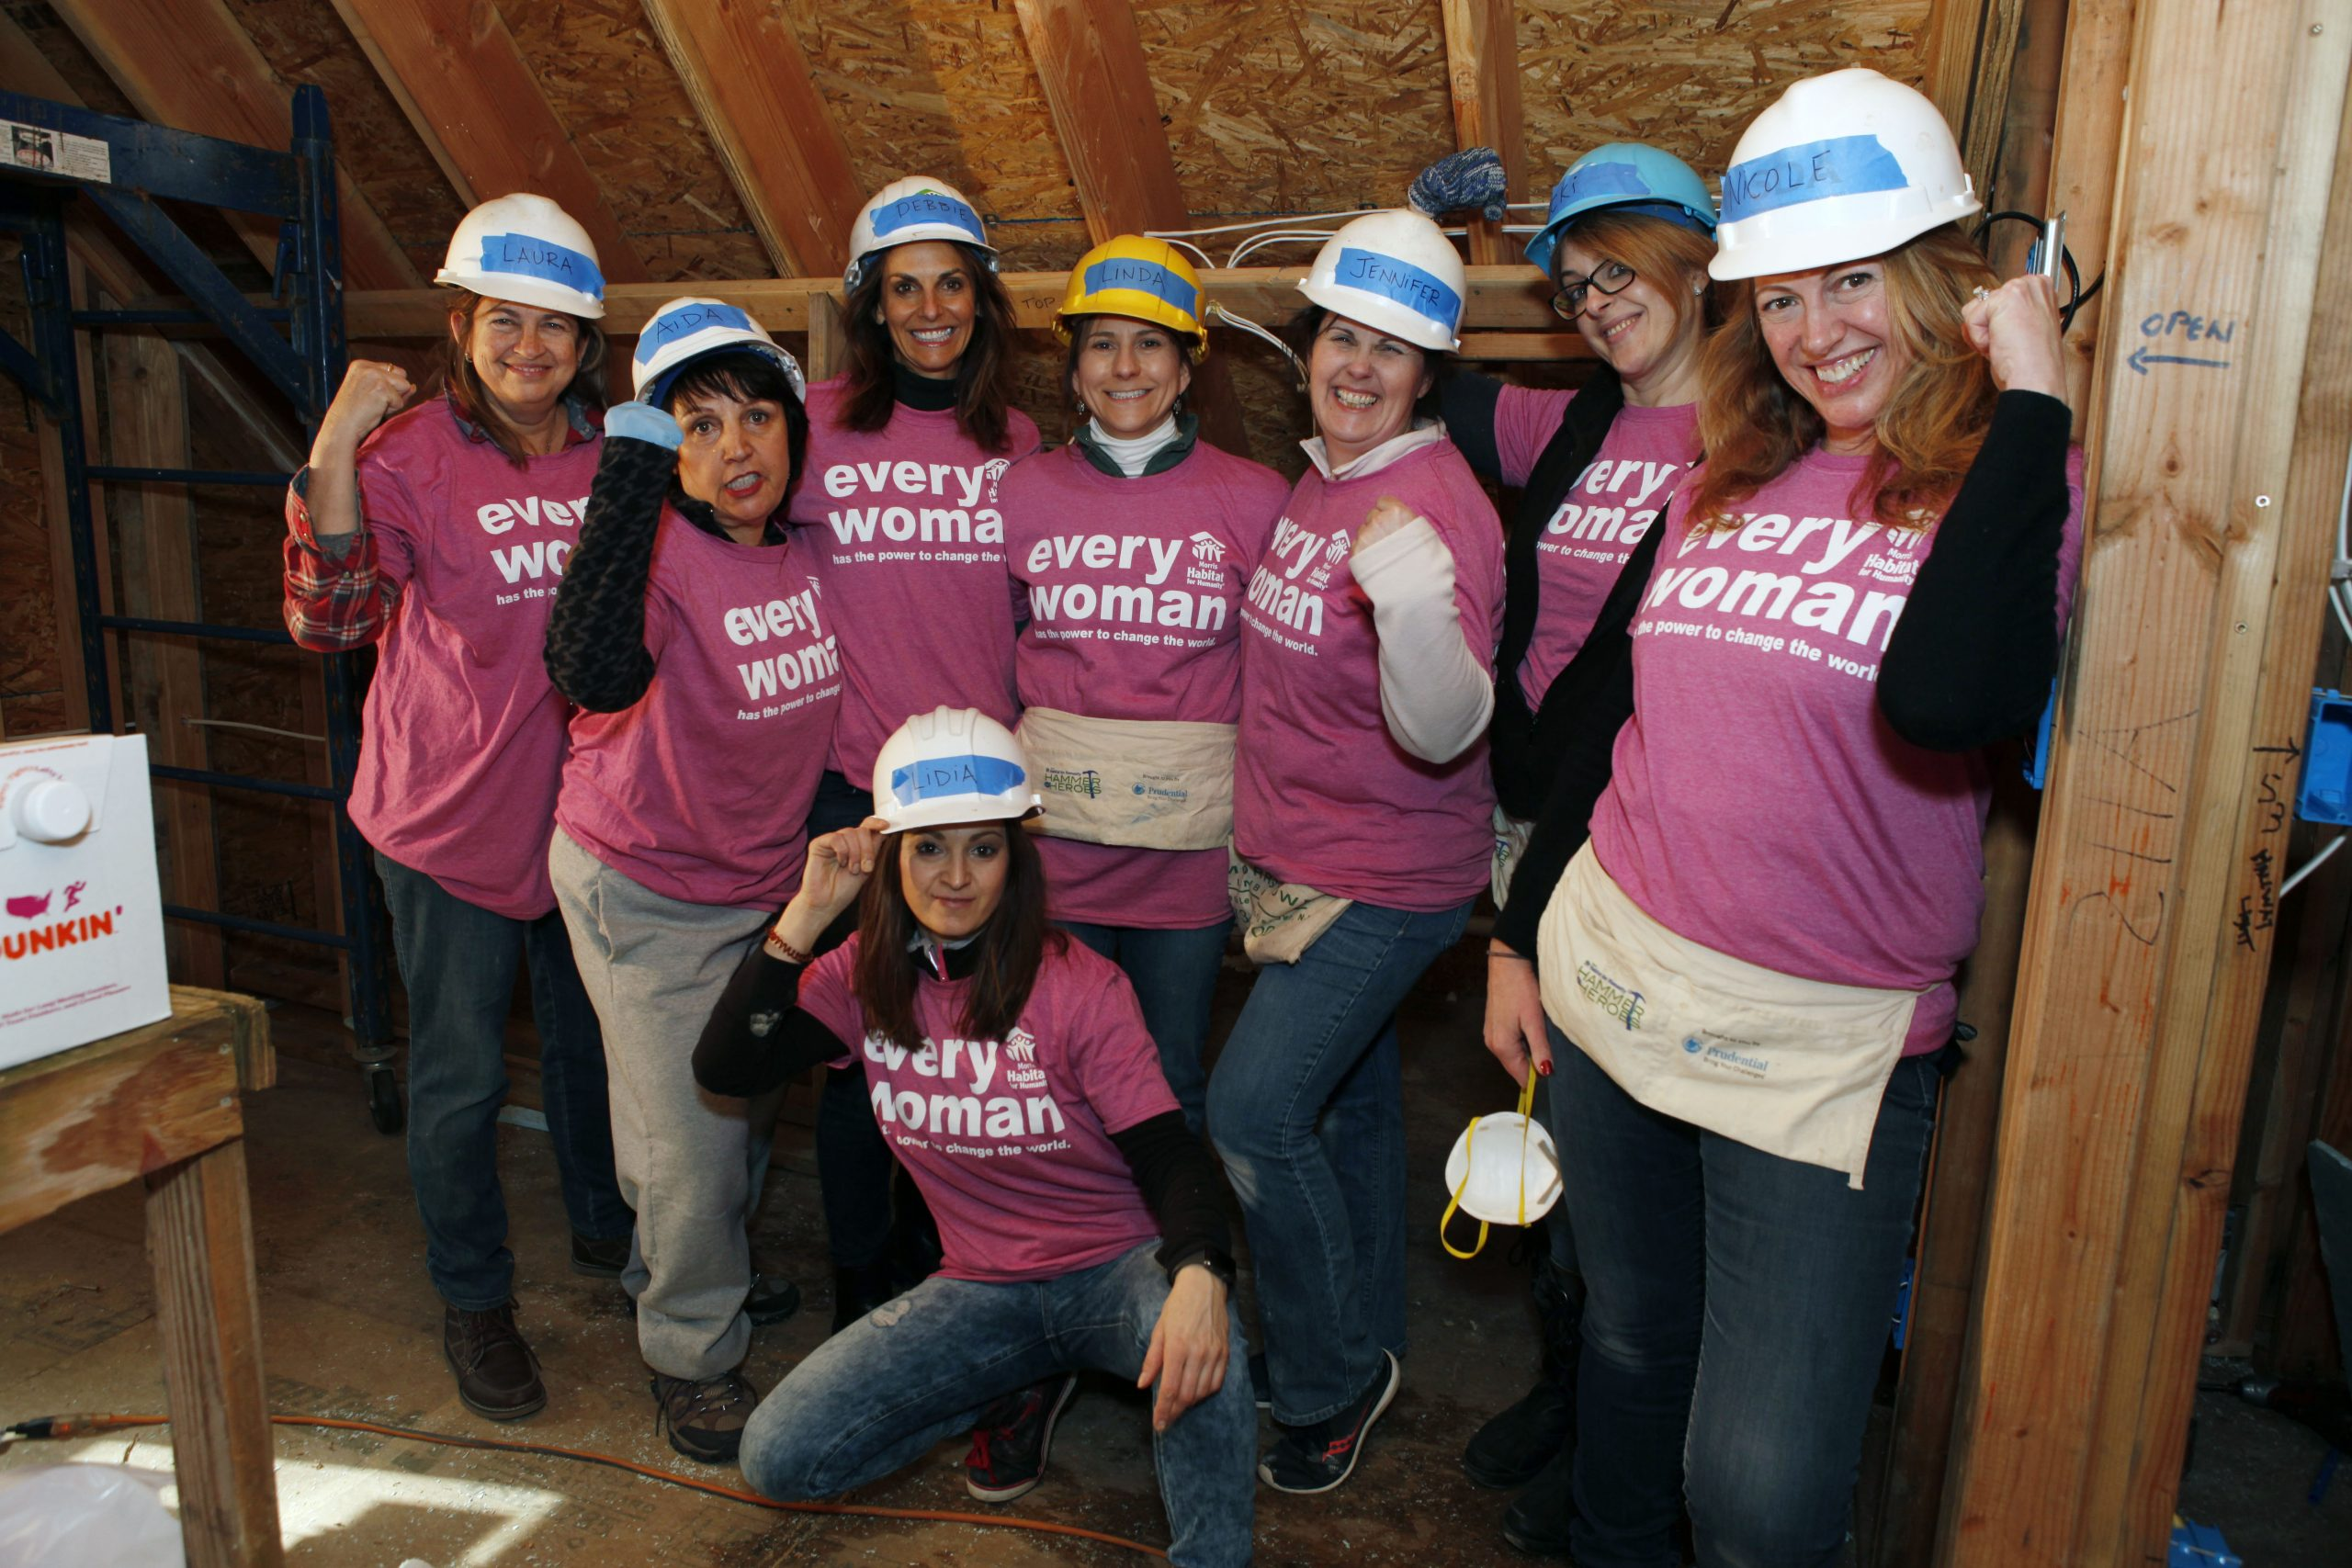 Morris habitat for humanity women's build 2020